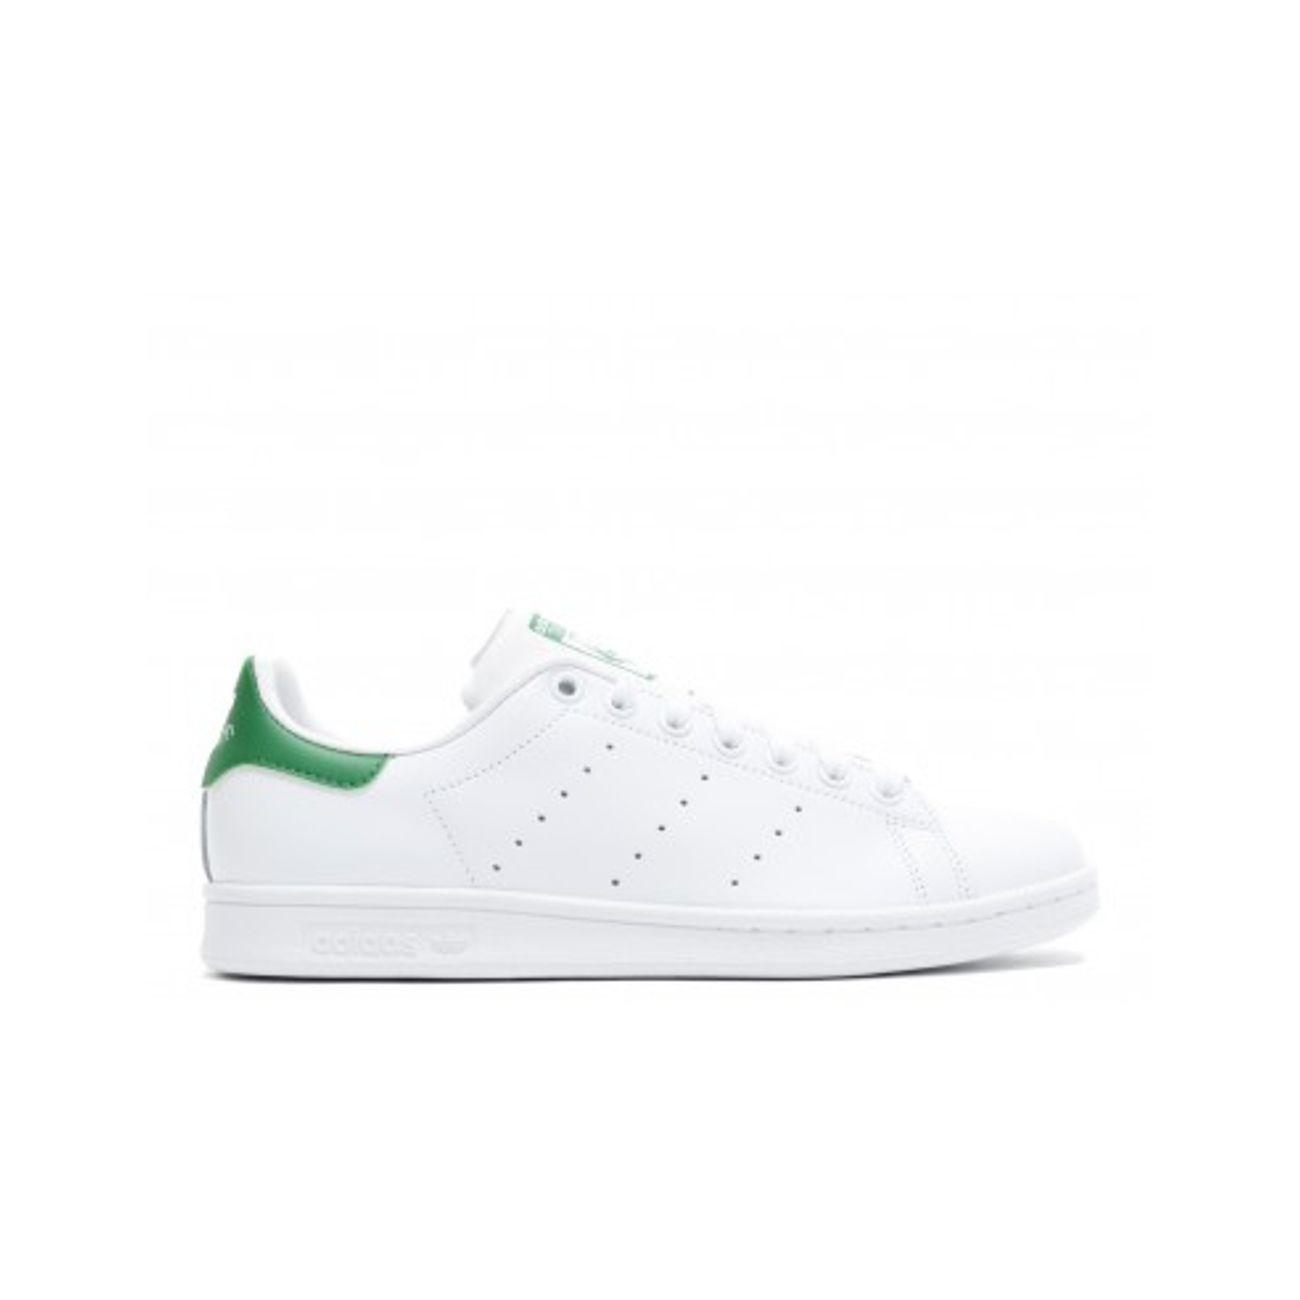 Chaussures Adidas STAN SMITH W </p>                 <!--bof Quantity Discounts table -->                                 <!--eof Quantity Discounts table -->                  <!--bof Product URL -->                                 <!--eof Product URL -->             </div>             <div id=